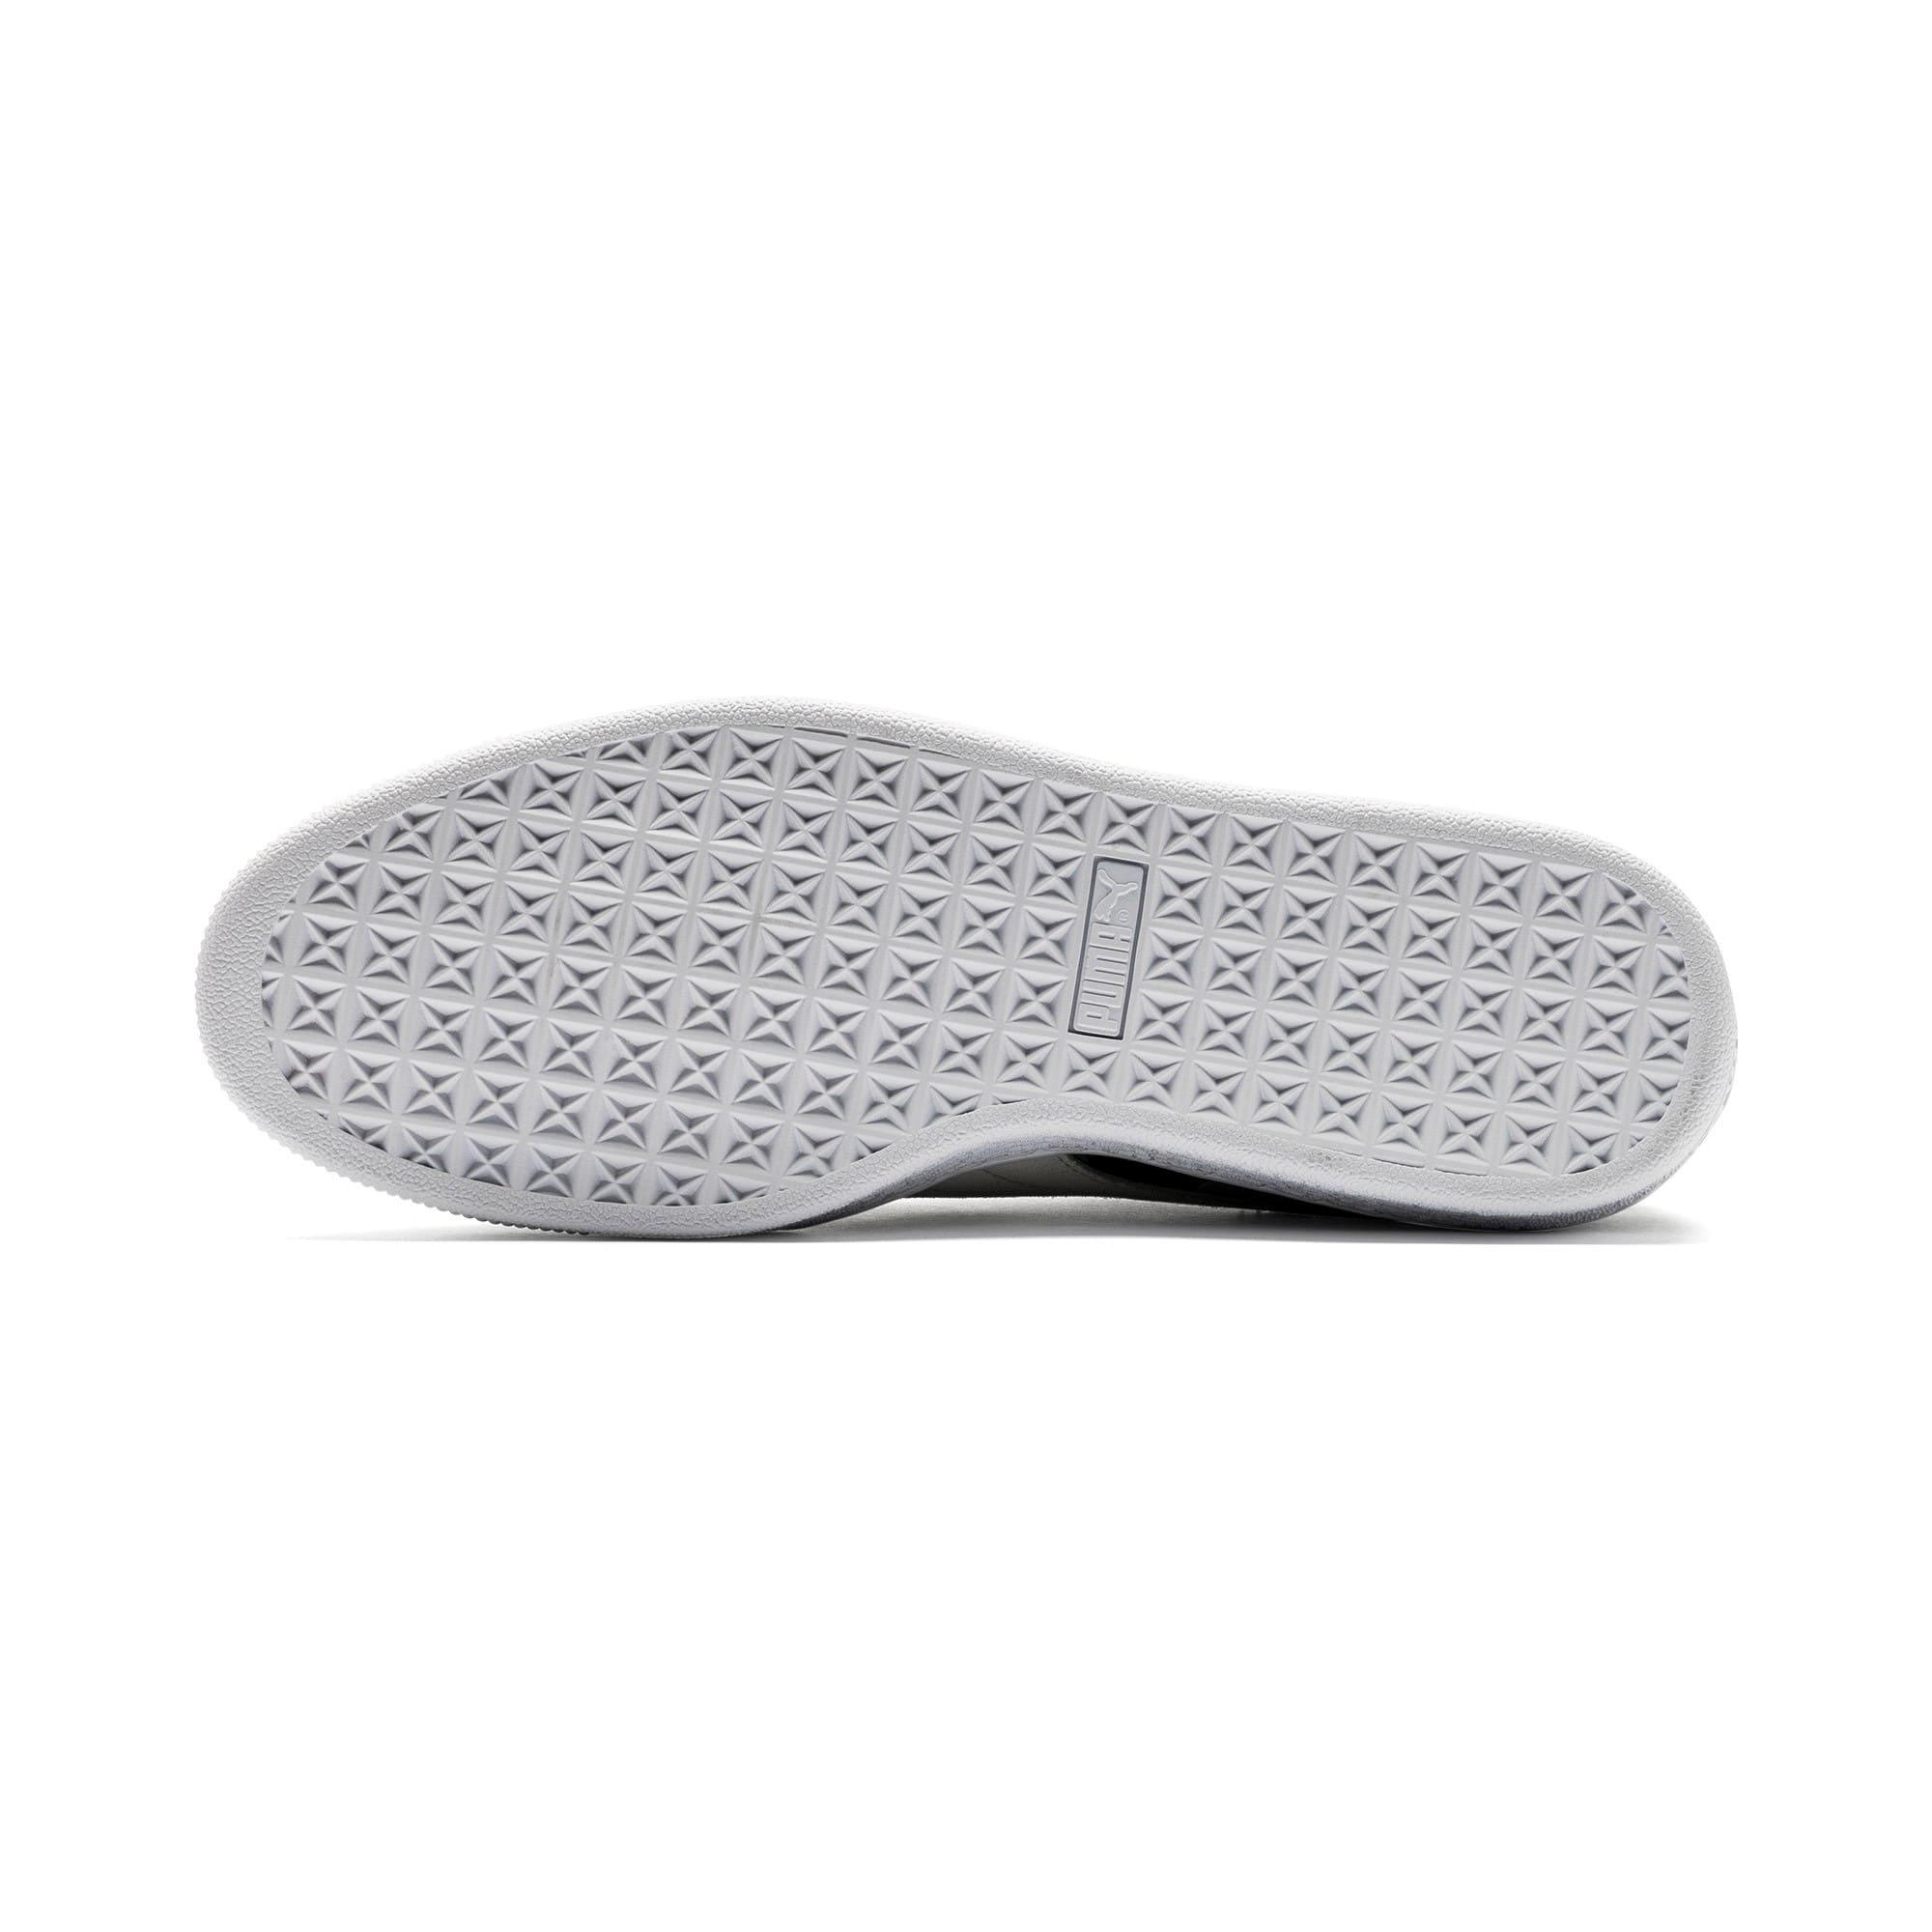 Thumbnail 4 of Suede Classic Ambush Sneakers, Puma Black-CASTLEROCK-White, medium